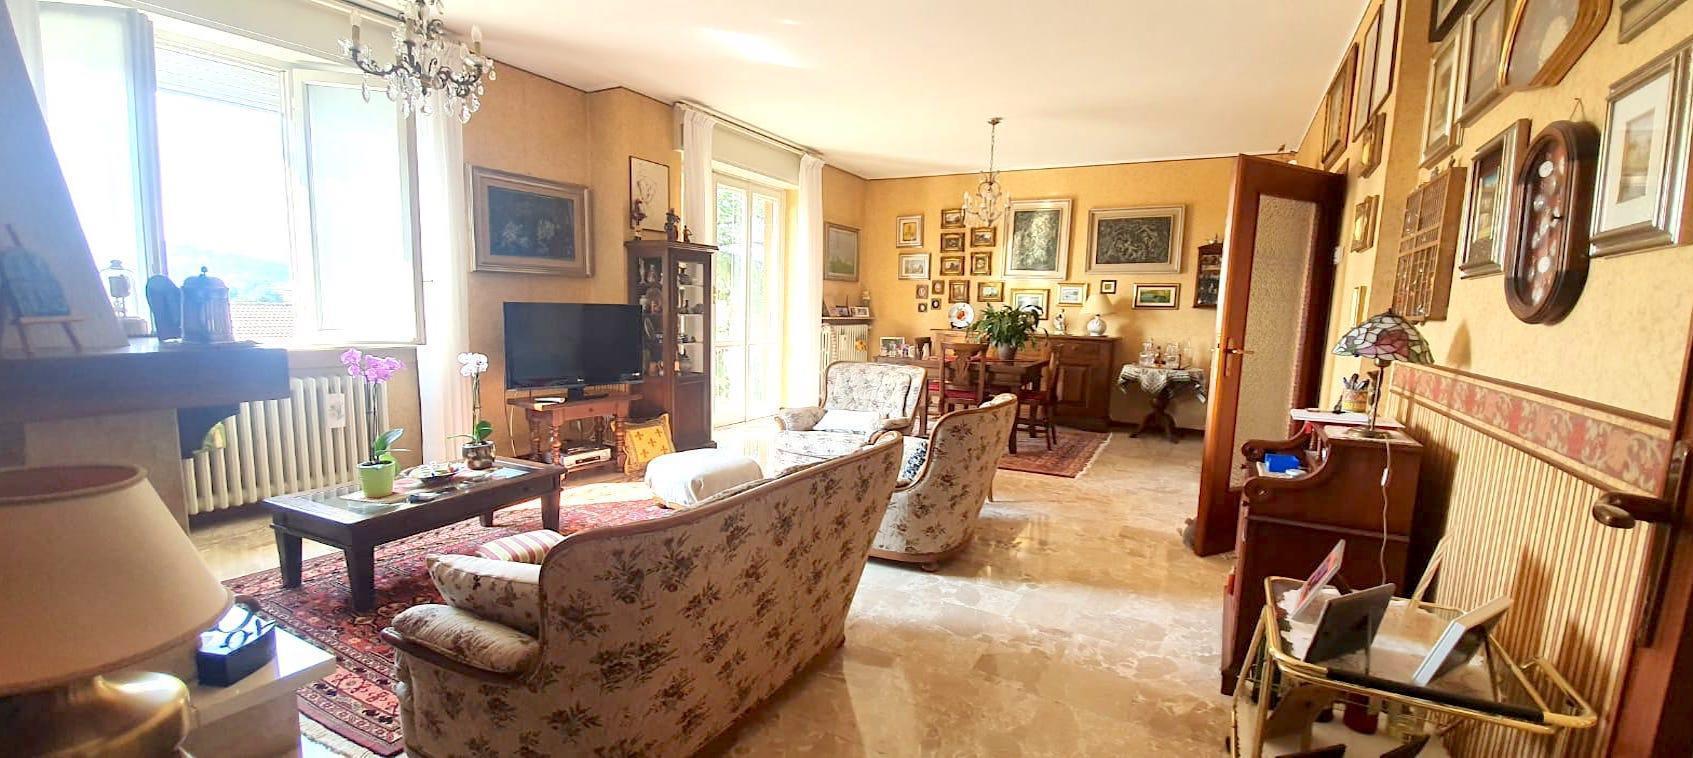 Vendita 5 Locali Appartamento Cernusco Lombardone Via Giuseppe Verdi 1 240065